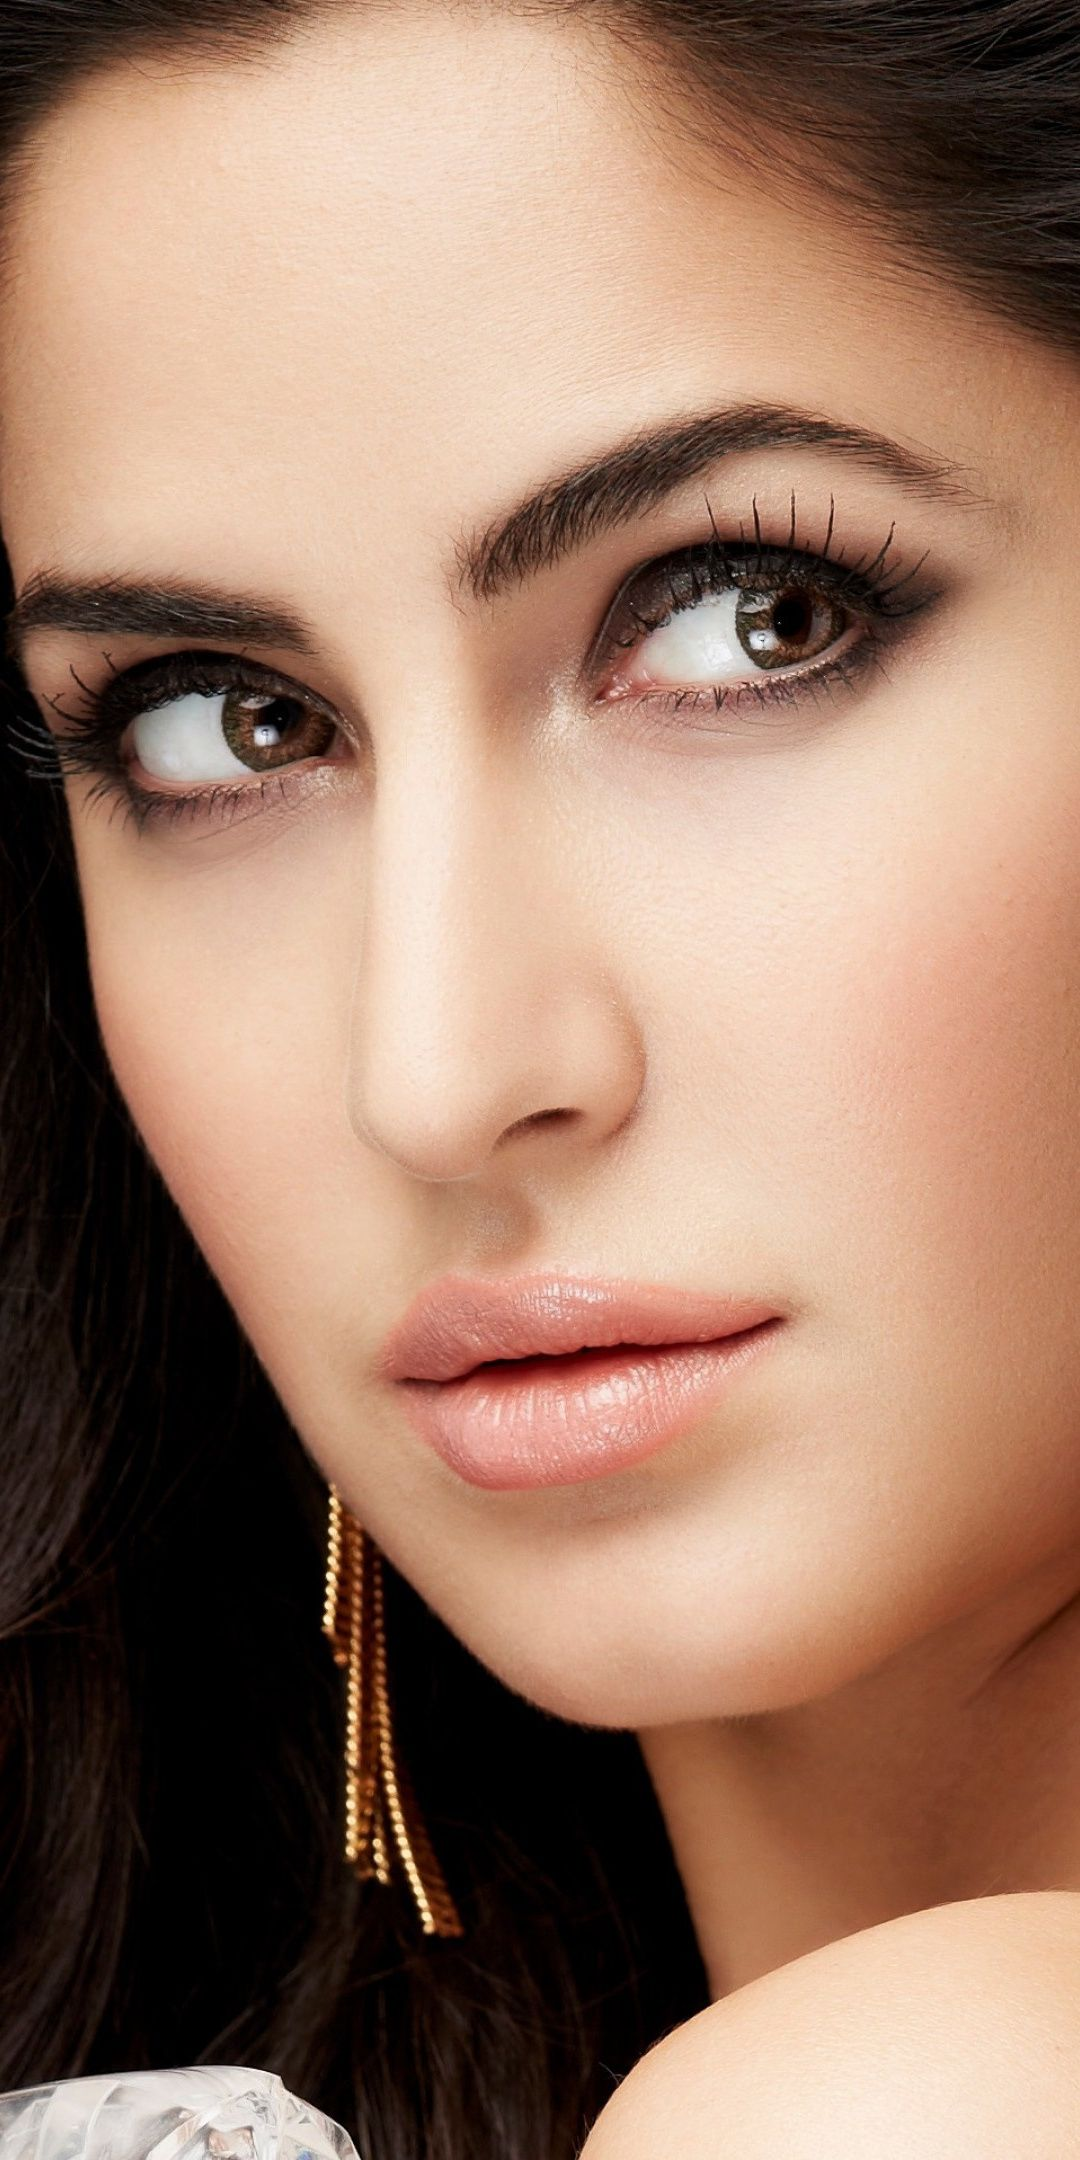 Katrina Kaif Face Bollywood 1080x2160 Wallpaper Katrina Kaif Photo Katrina Kaif Images Katrina Kaif Wallpapers